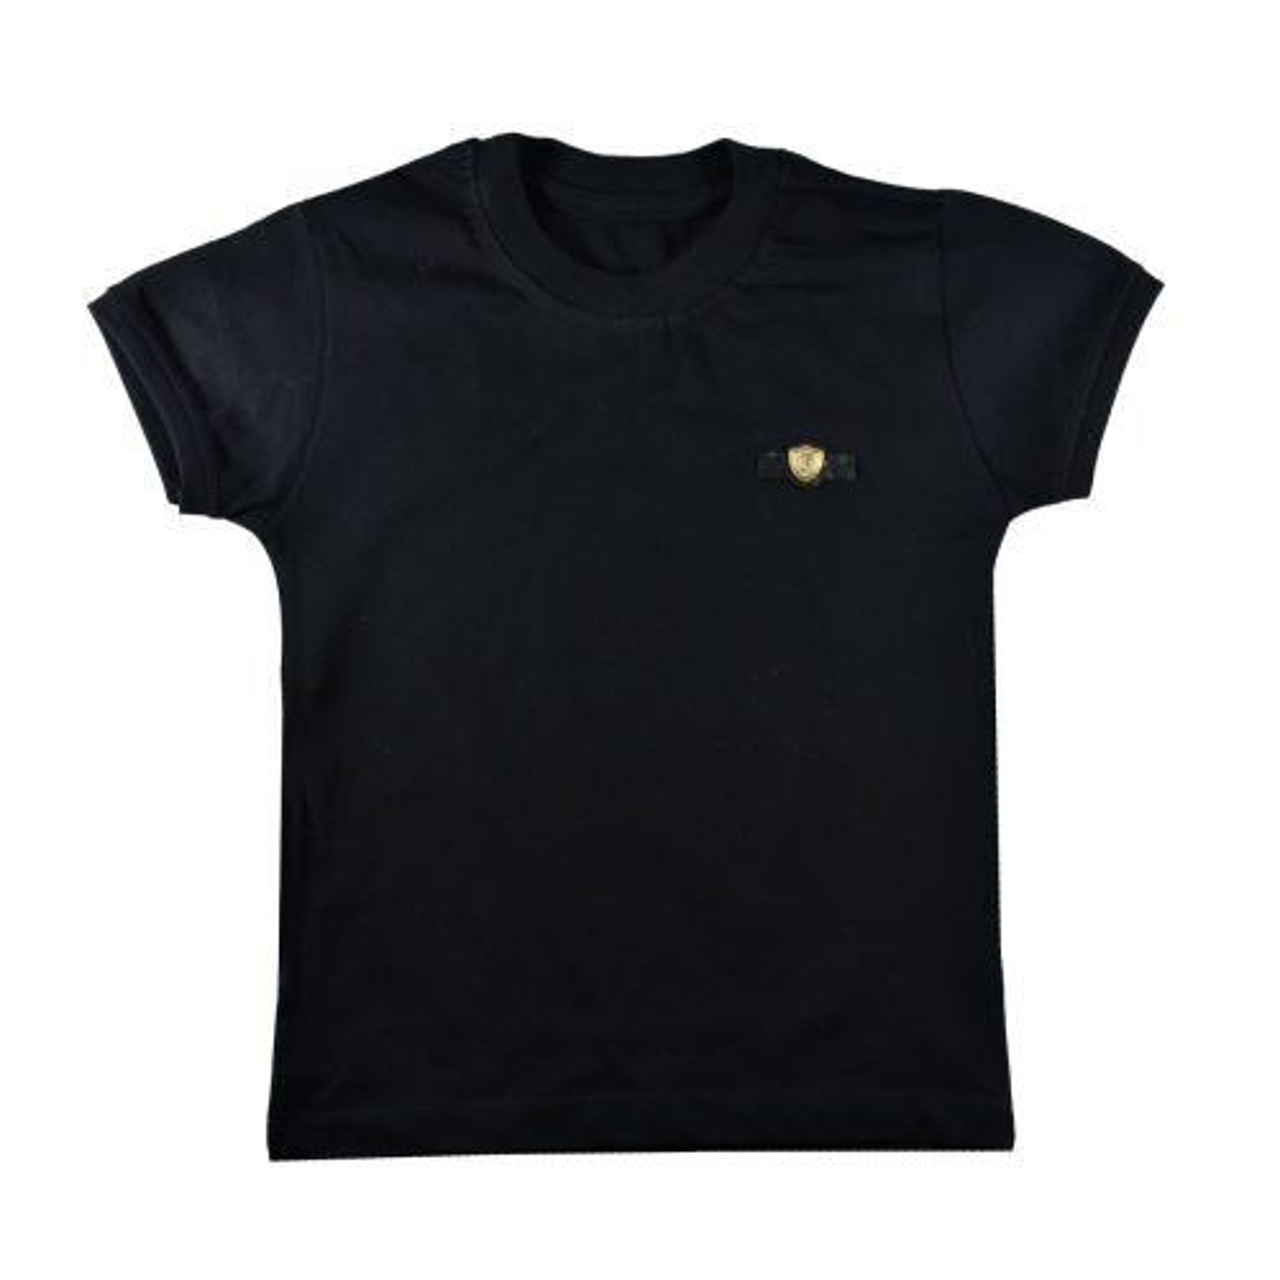 تی شرت پسرانه کد 128